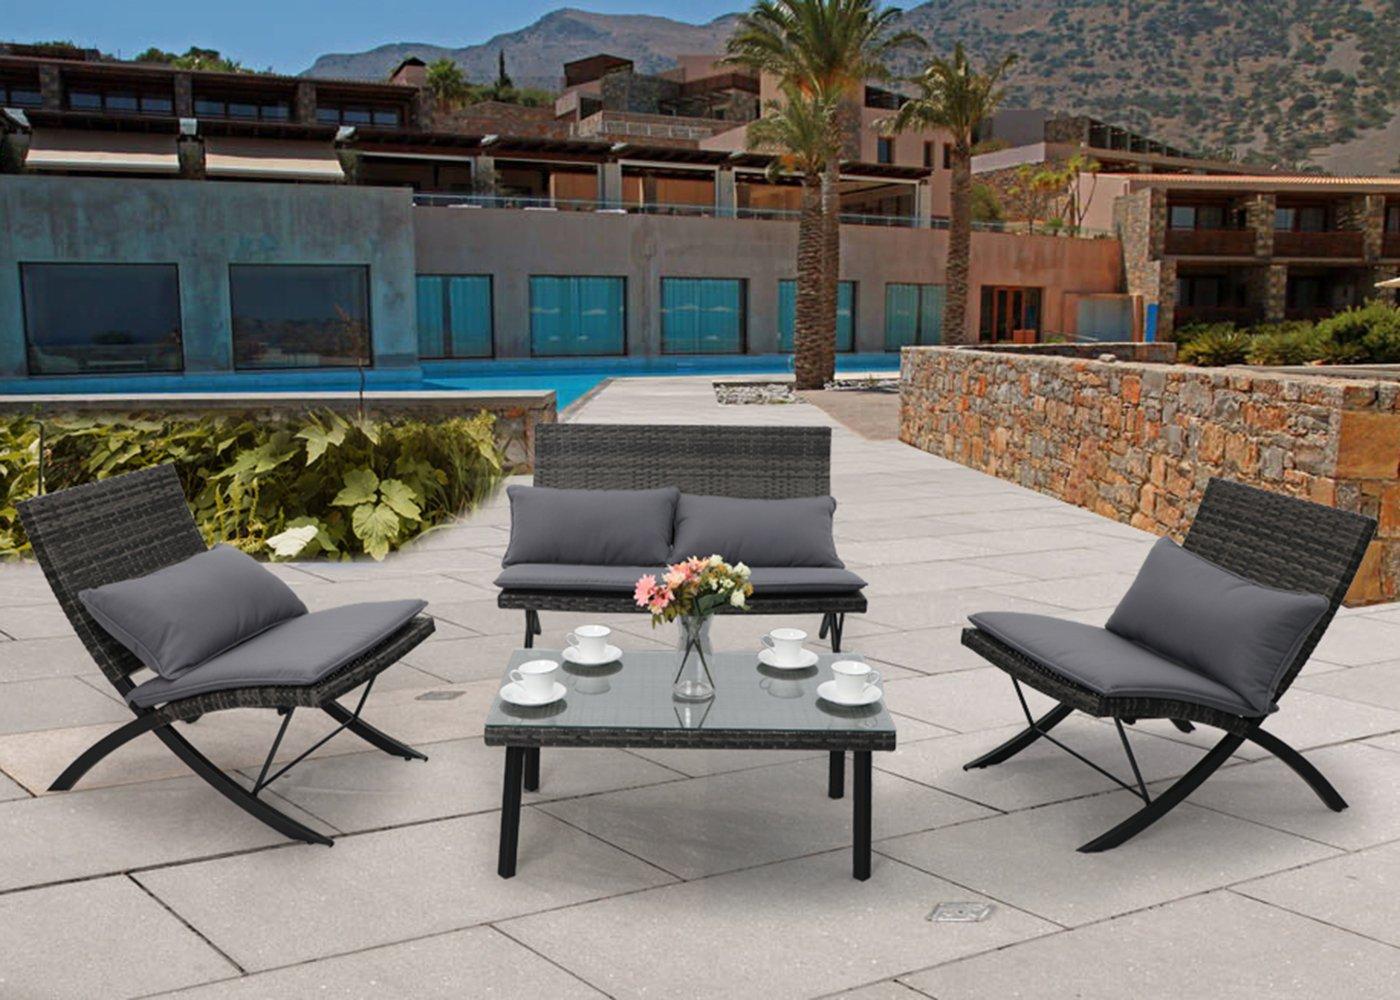 Dark Grey Patio Furniture Sets GDF Studio Nealie Patio Furniture ~ 4 Piece Outdoor Aluminum Chat Set & Dark Grey Patio Furniture Sets GDF Studio Nealie Patio Furniture ~ 4 ...